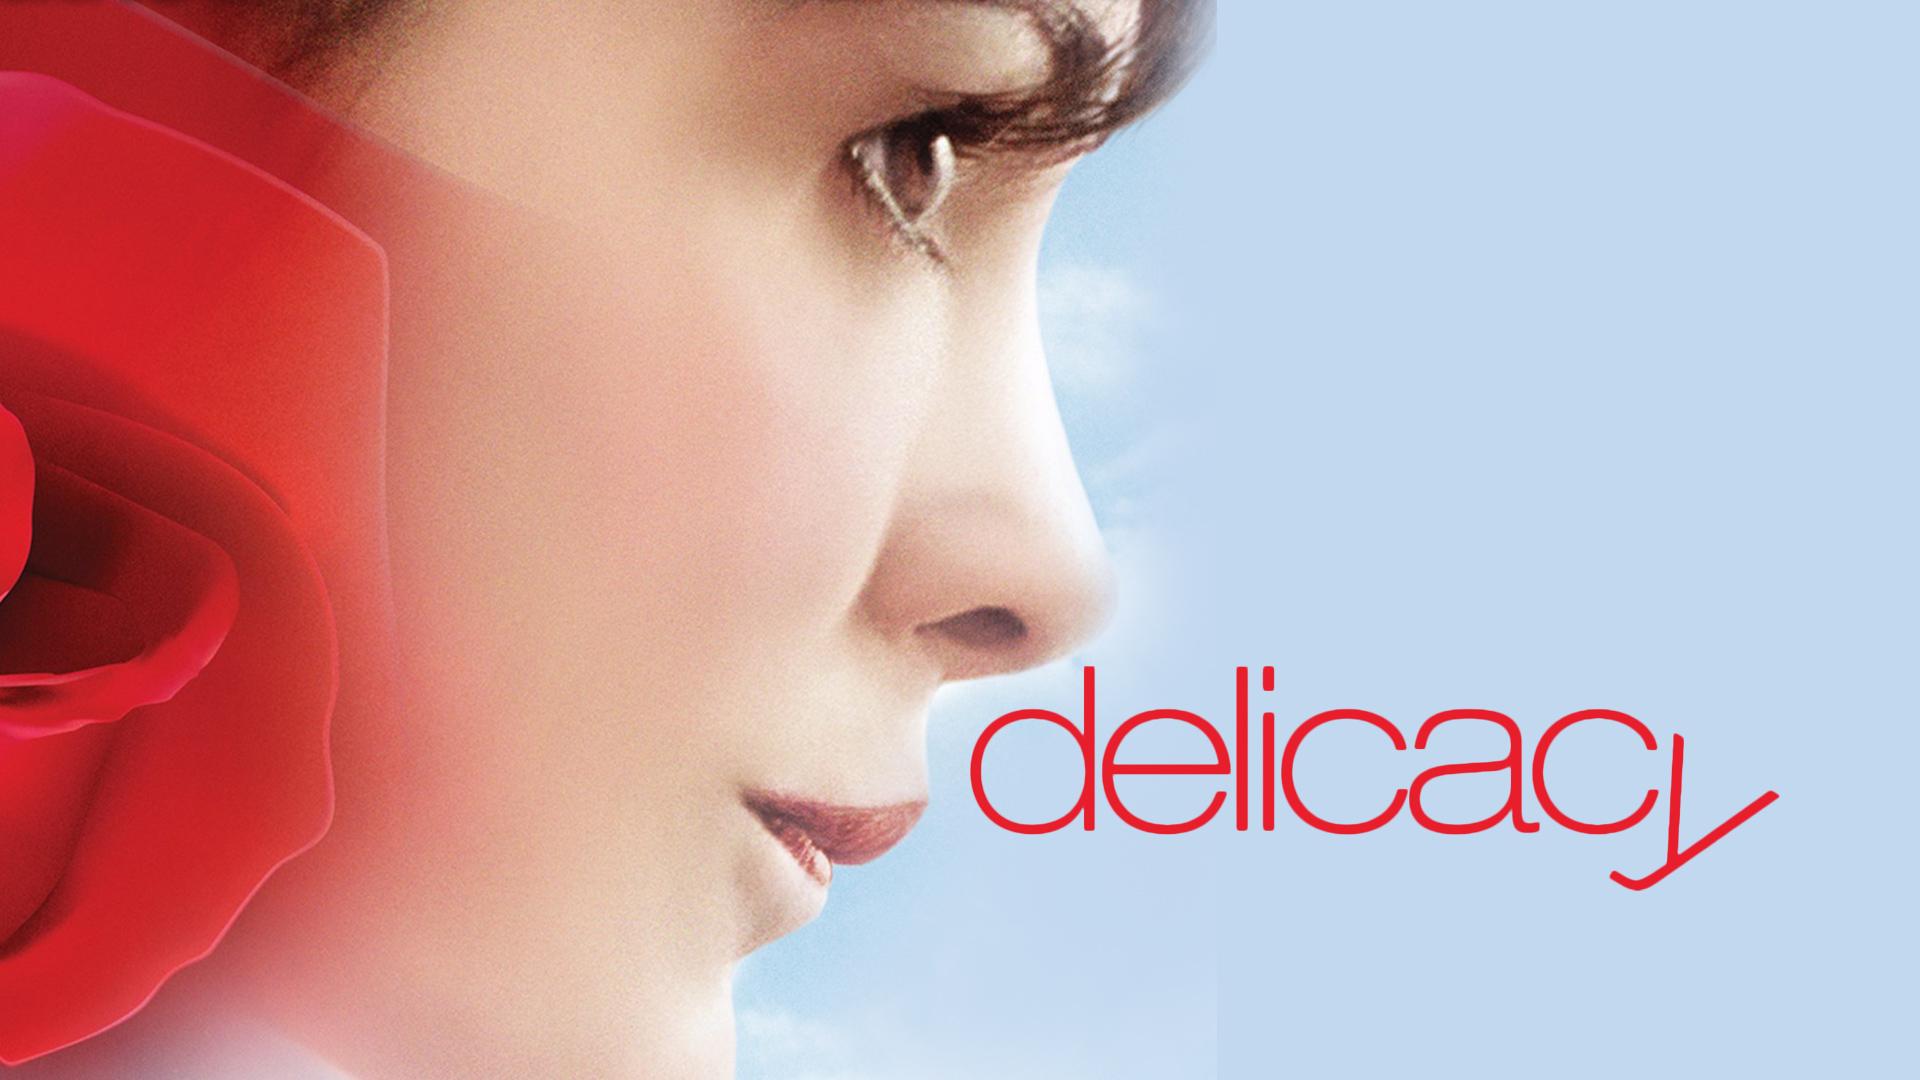 Delicacy (English Subtitled)